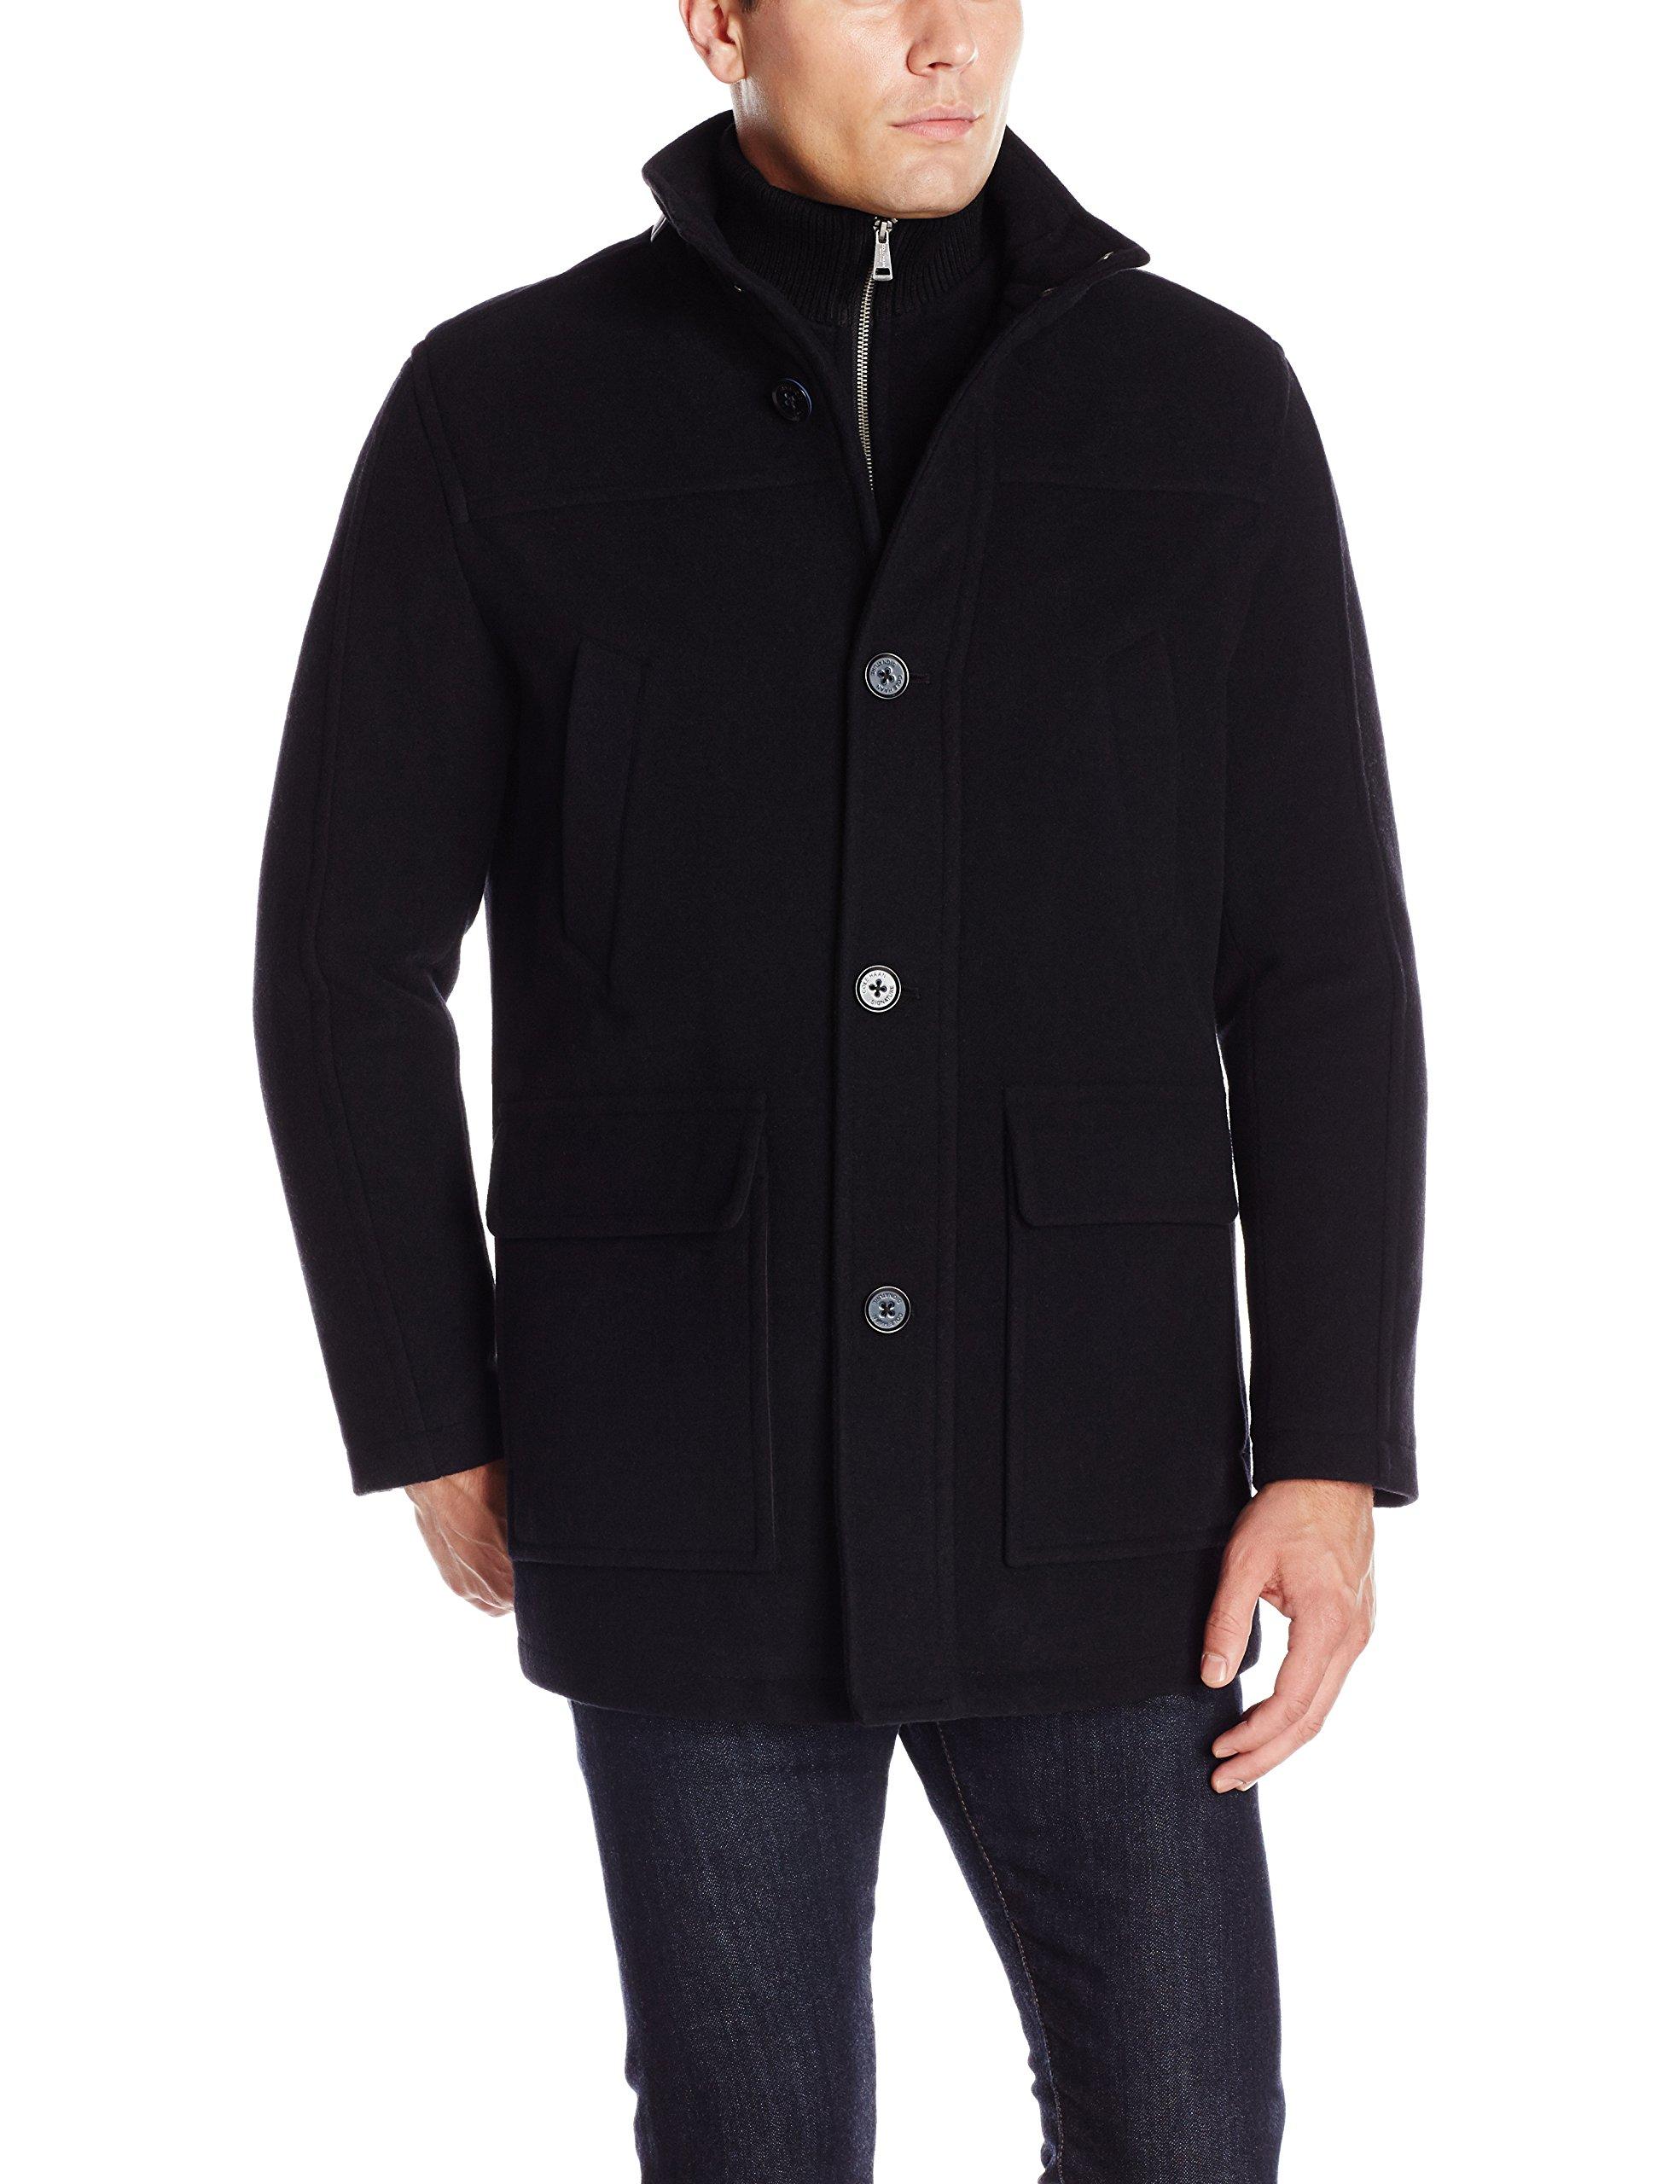 Cole Haan Signature Men's Wool Plush Car Coat with Attached Bib, Black, Medium by Cole Haan Signature